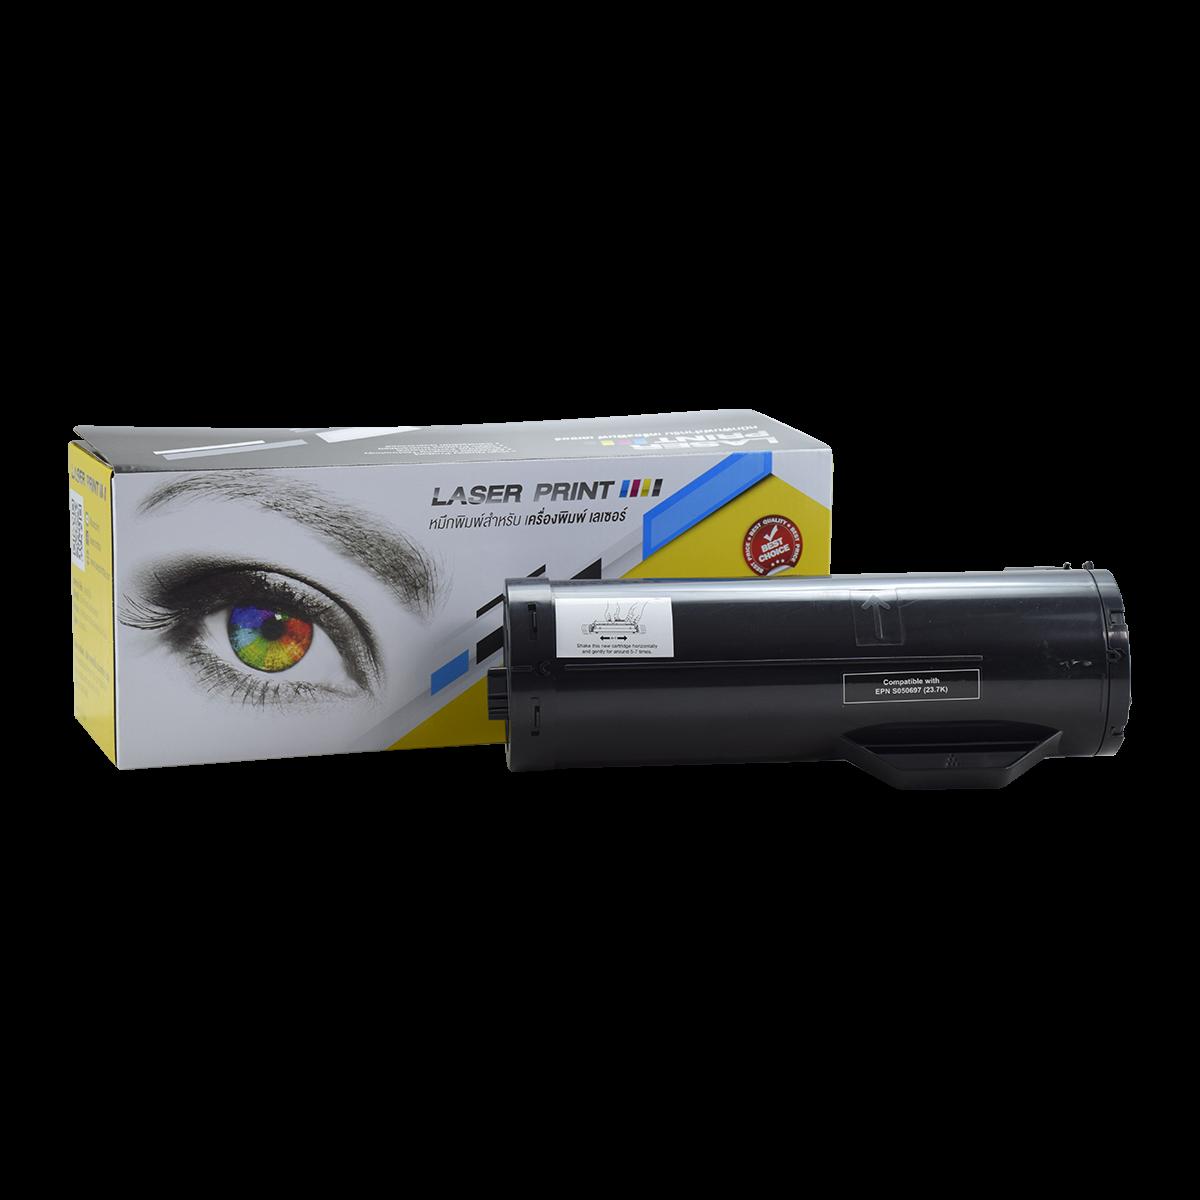 S050697/S050698 (23K) M400 Laserprint Epson  Black